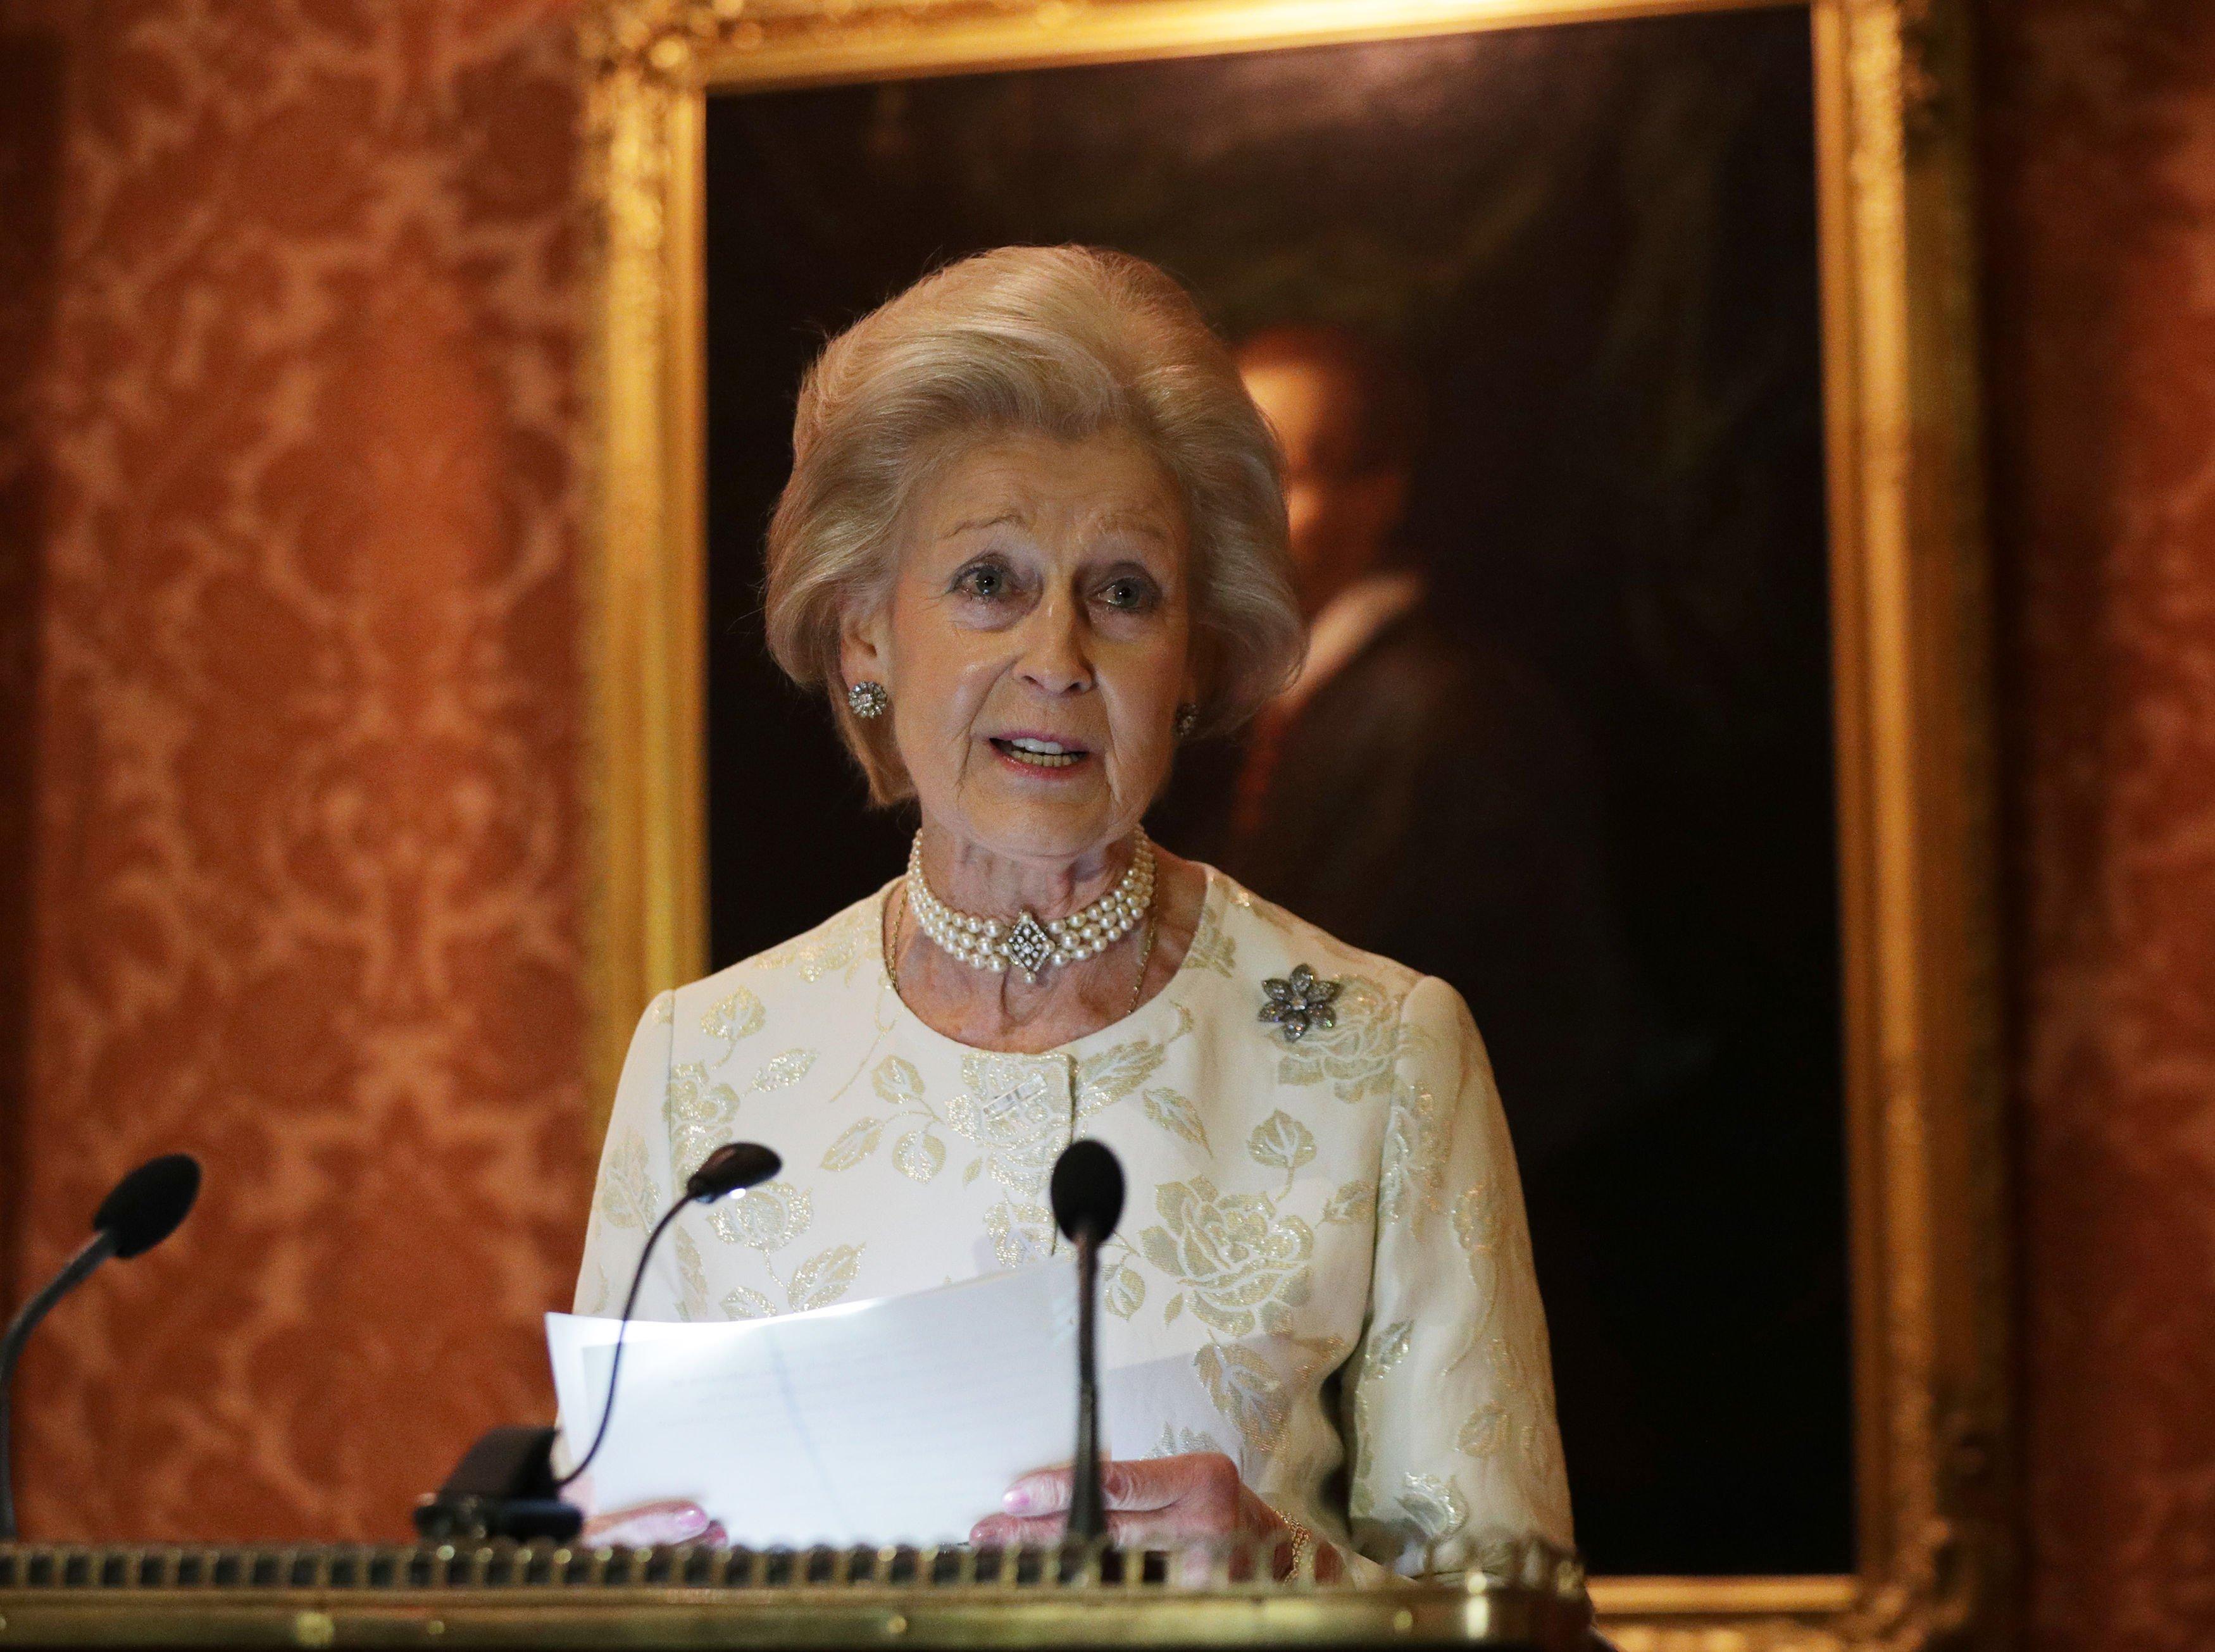 Princess Alexandra praises strength of Cornwall's community amid fears for its economy